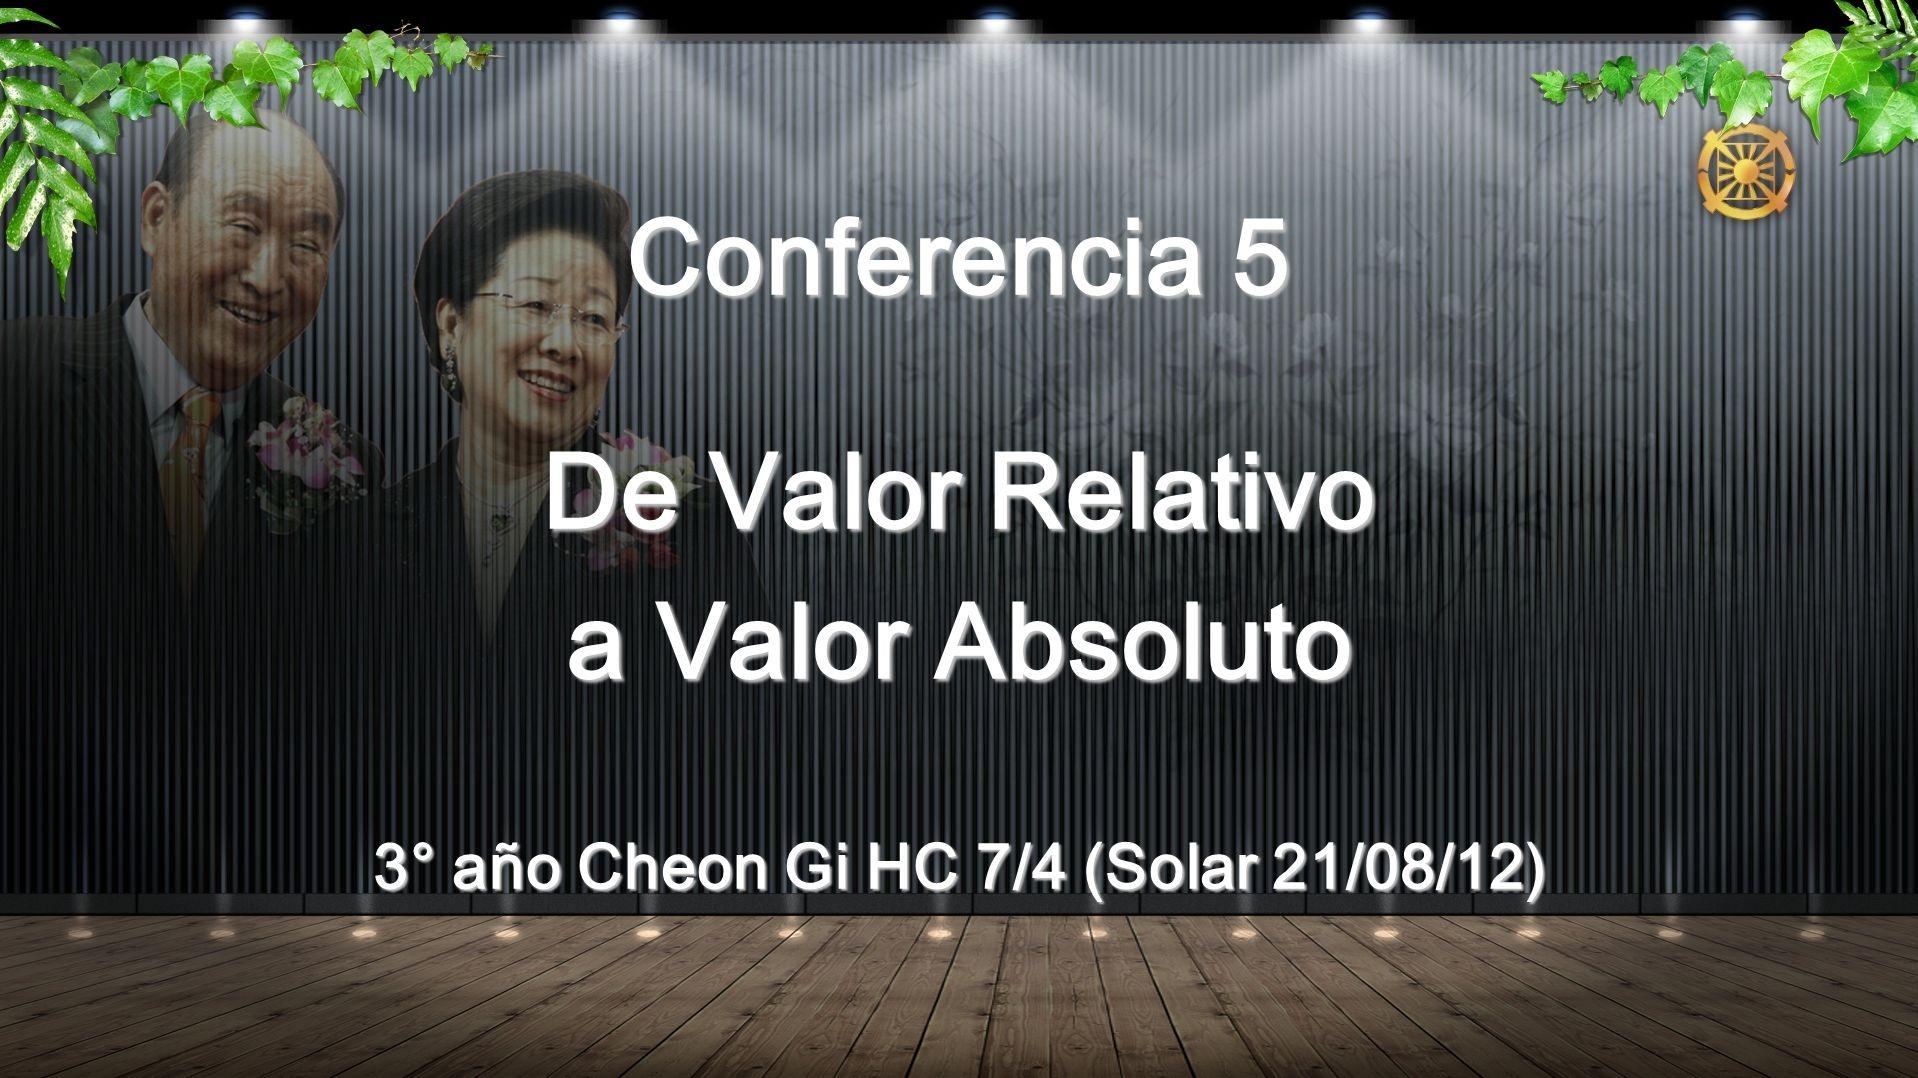 3° año Cheon Gi HC 7/4 (Solar 21/08/12)